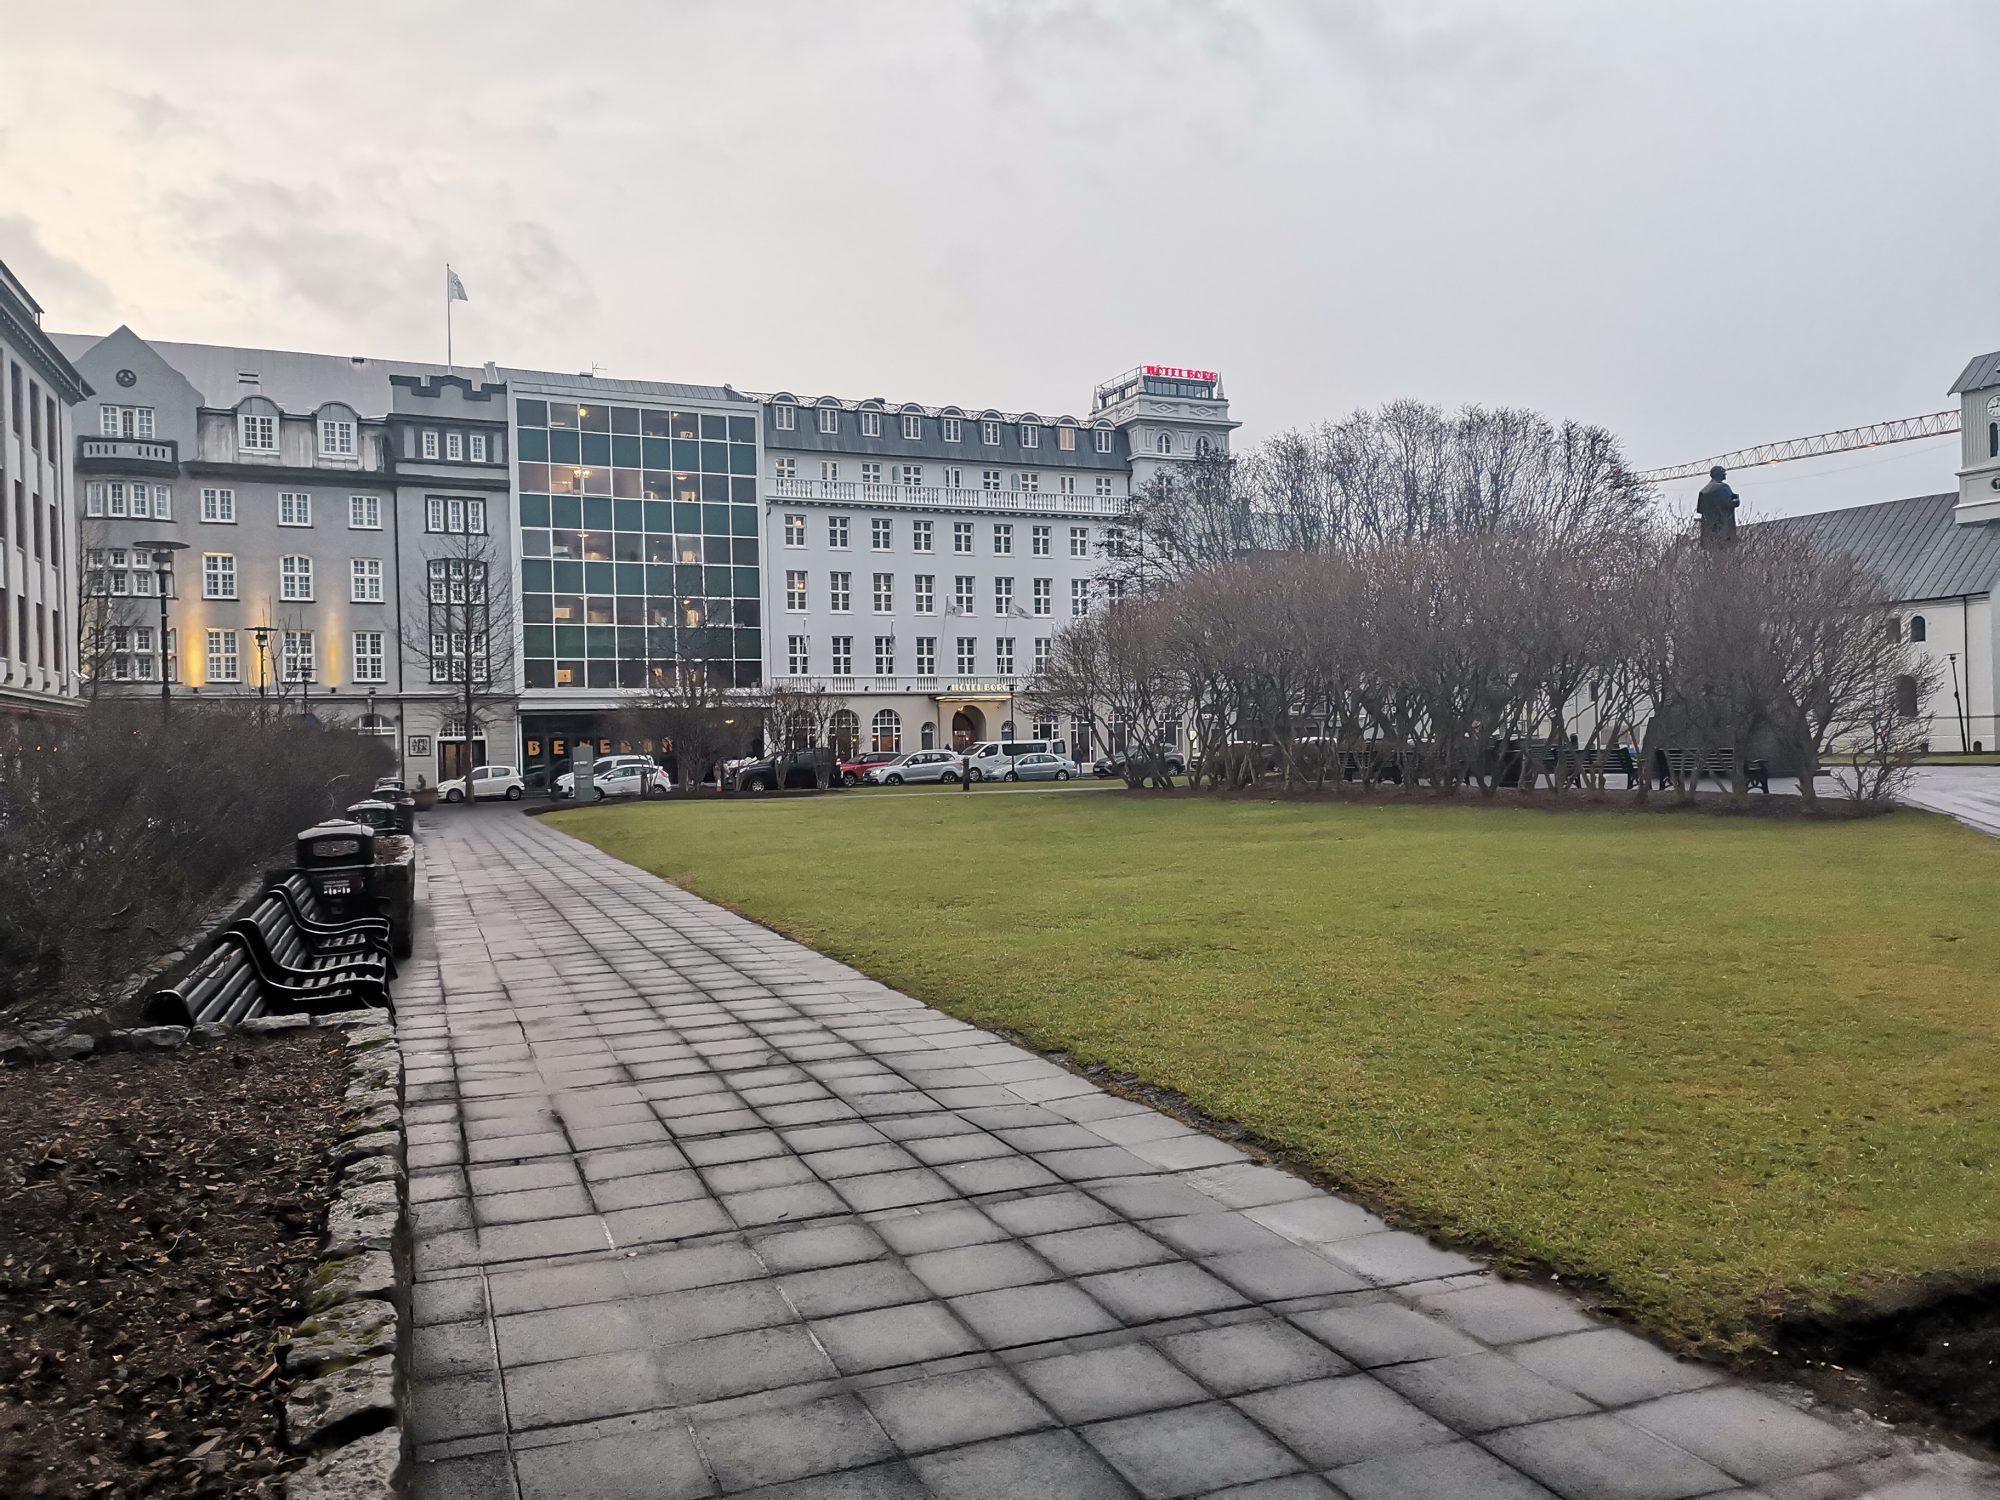 Austurvöllur SquareSightseeing i Reykjavik